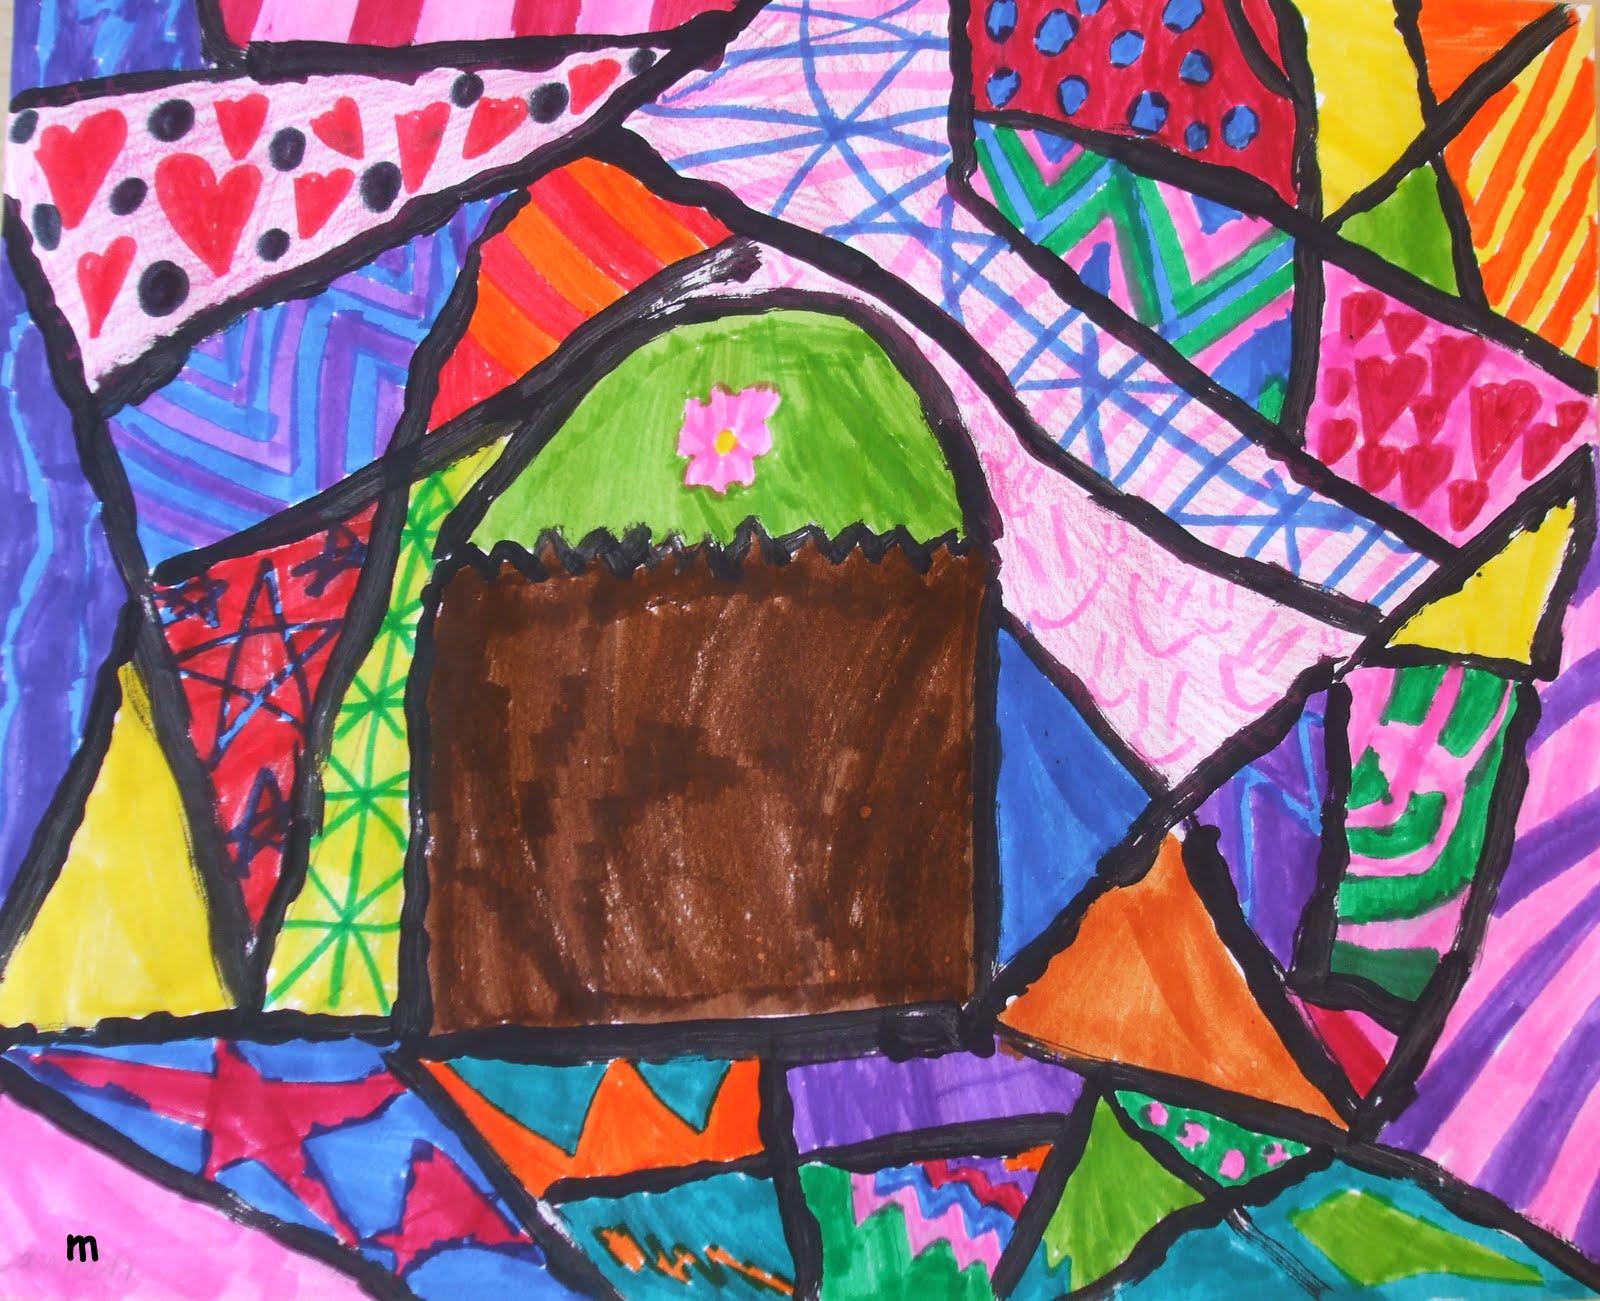 rainbow skies dragonflies 3d grade pop art abstracts. Black Bedroom Furniture Sets. Home Design Ideas